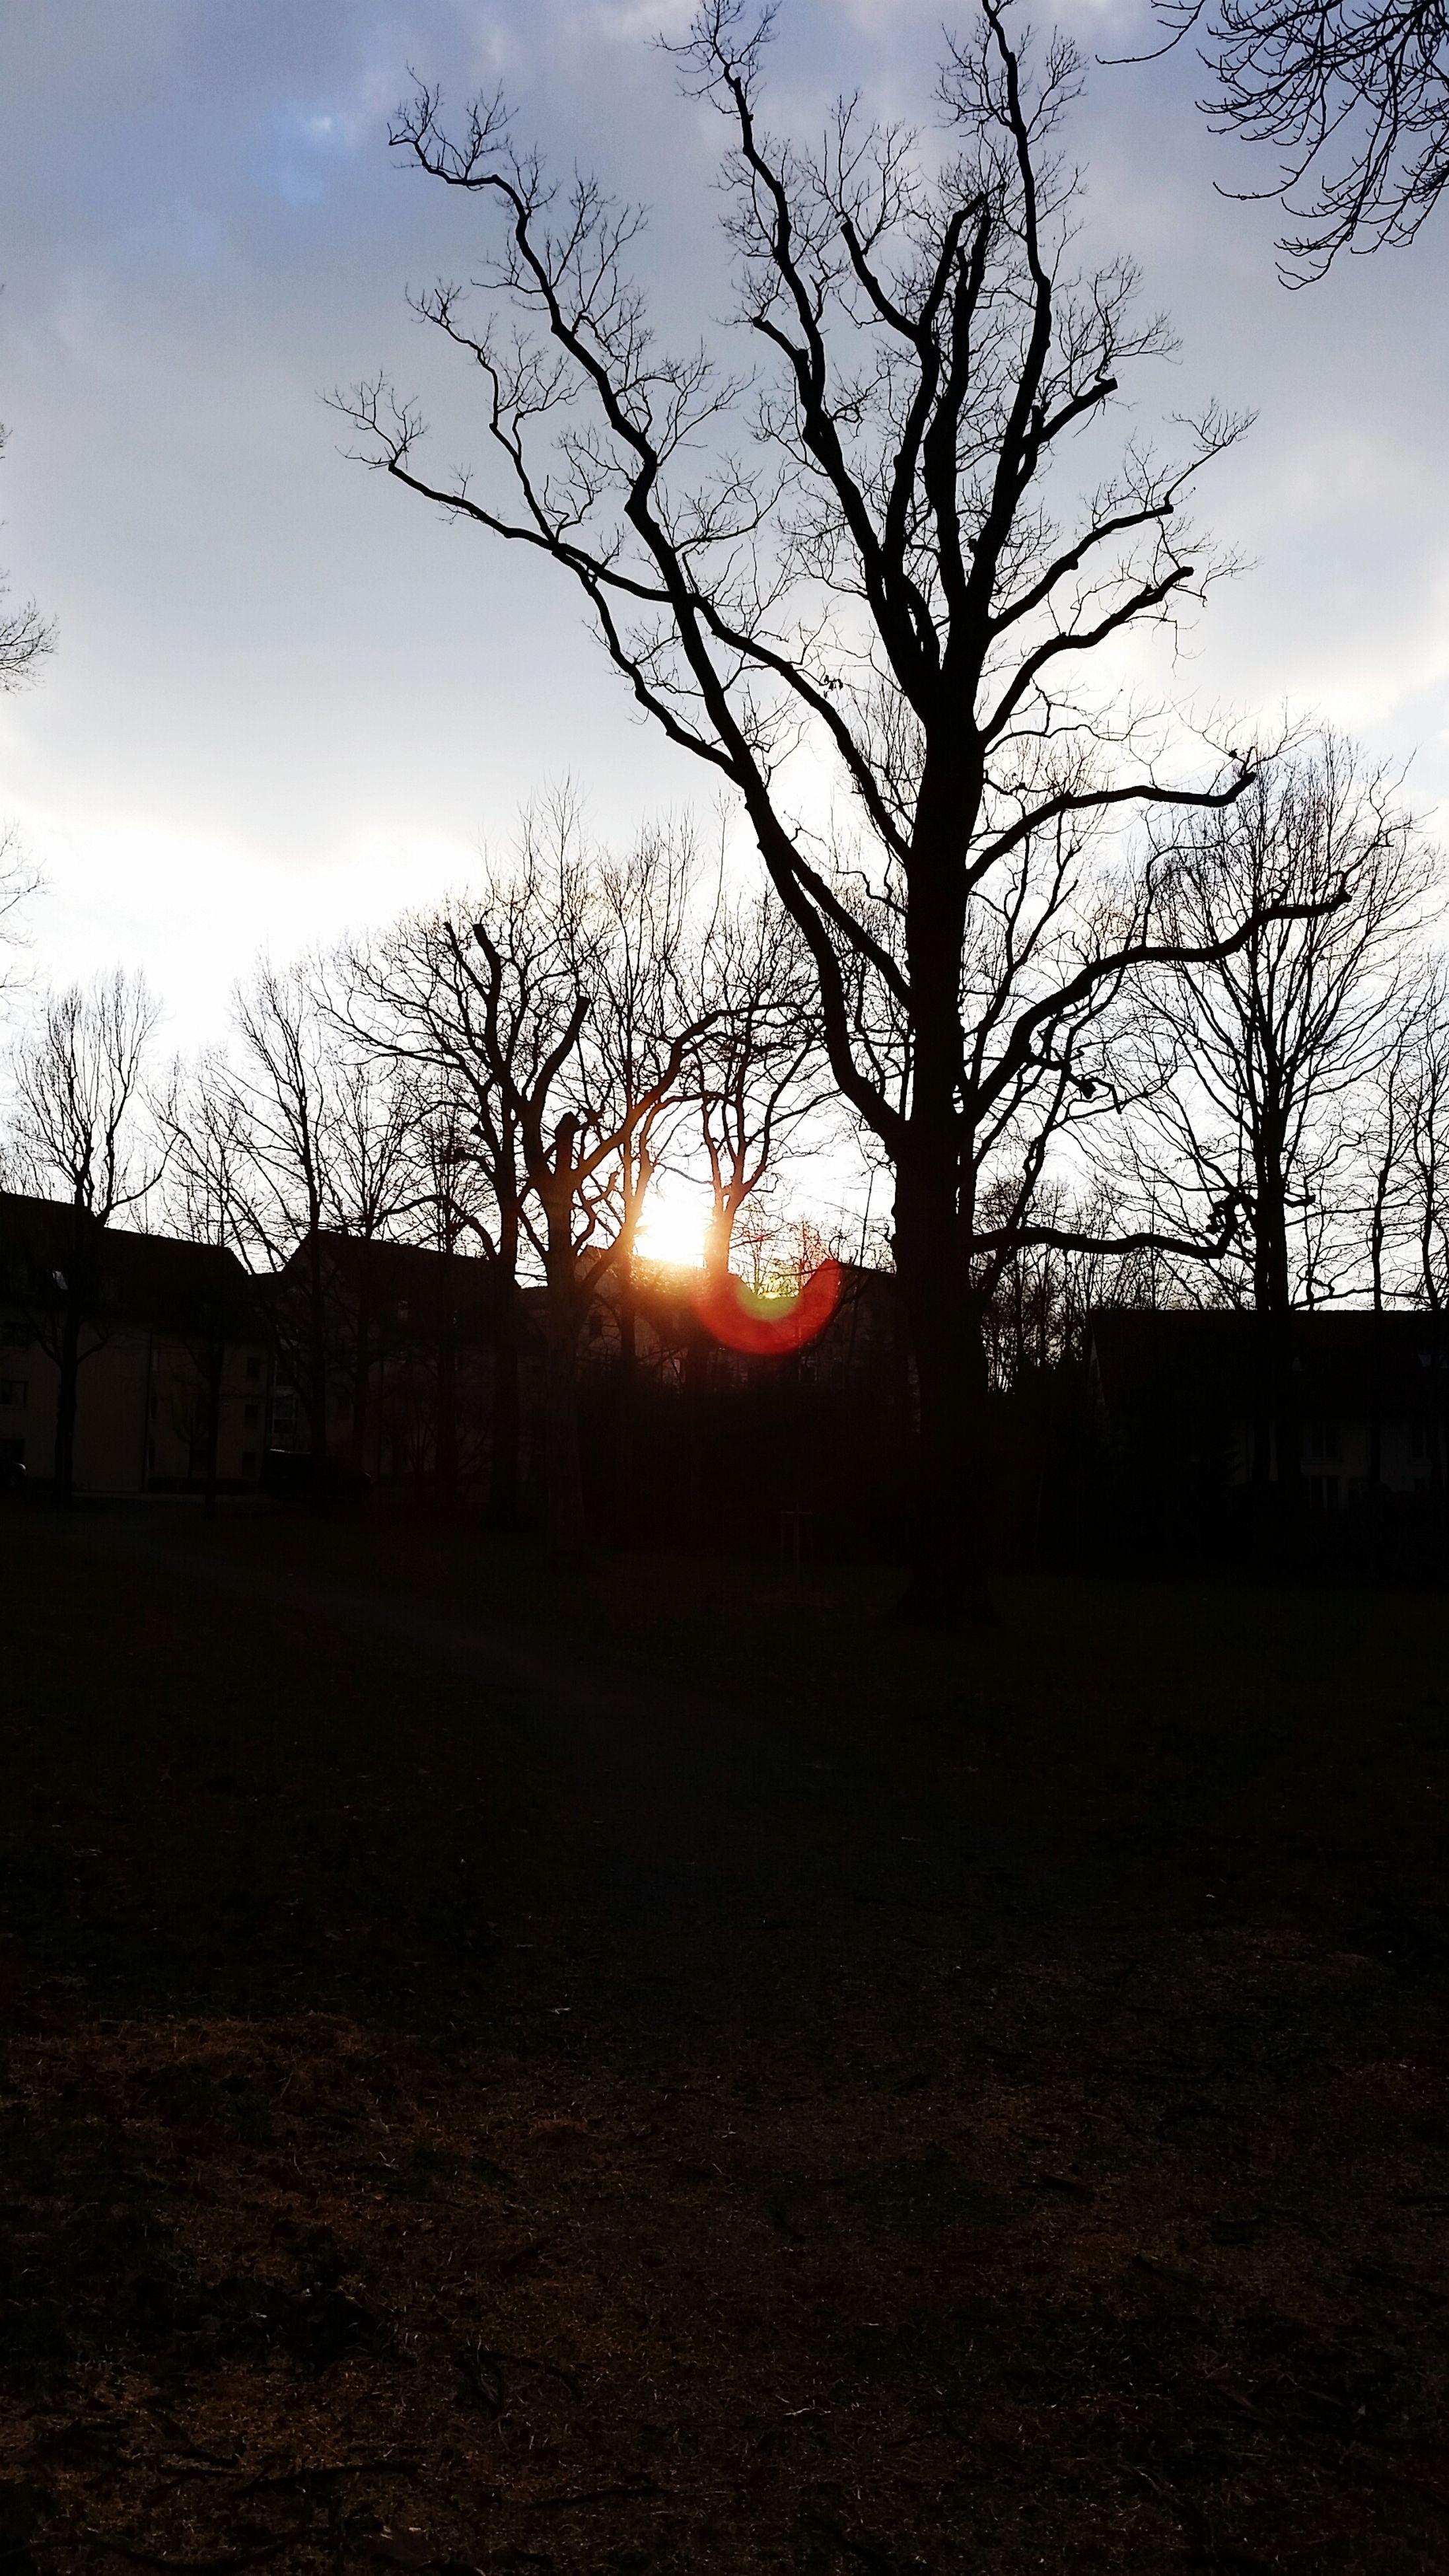 sunset, bare tree, silhouette, tree, sky, sun, tranquility, tranquil scene, scenics, landscape, beauty in nature, nature, field, branch, cloud - sky, sunlight, orange color, idyllic, back lit, no people